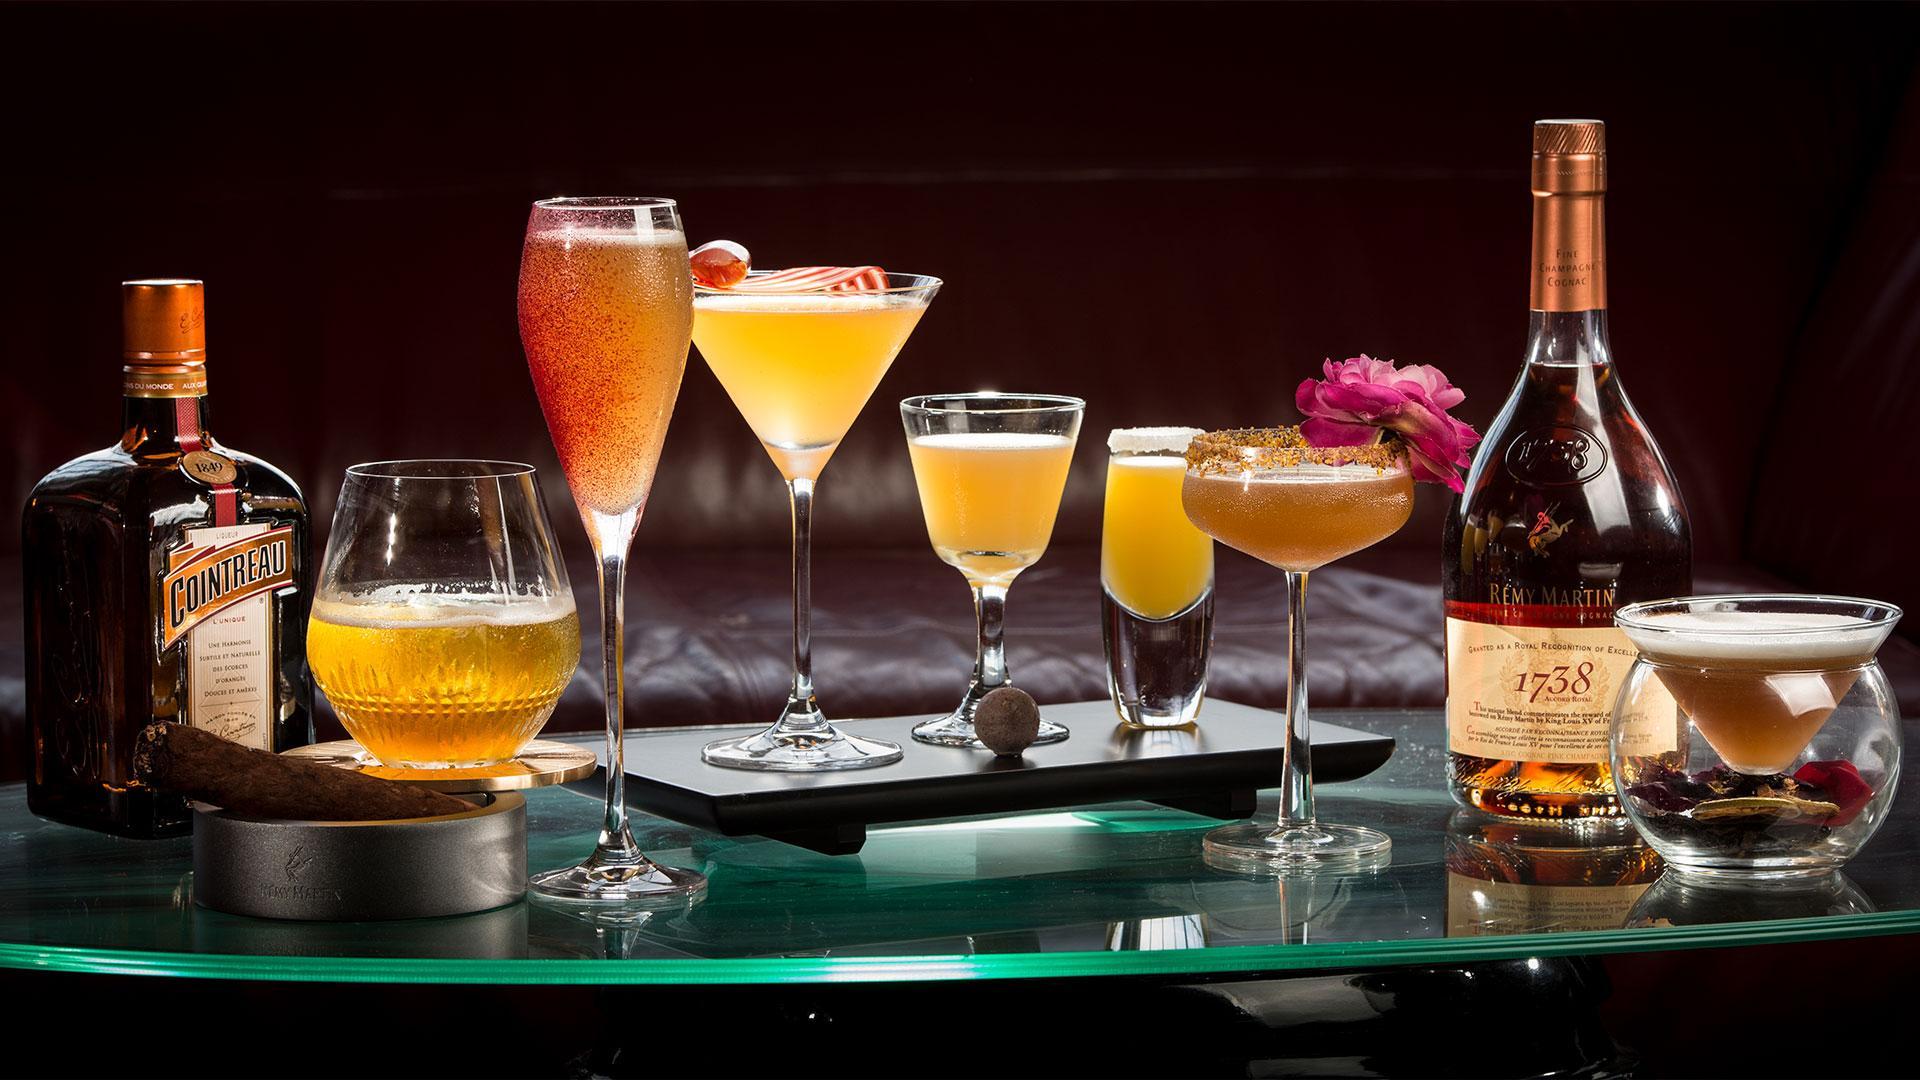 Sidecar bar at London Cocktail Week 2018